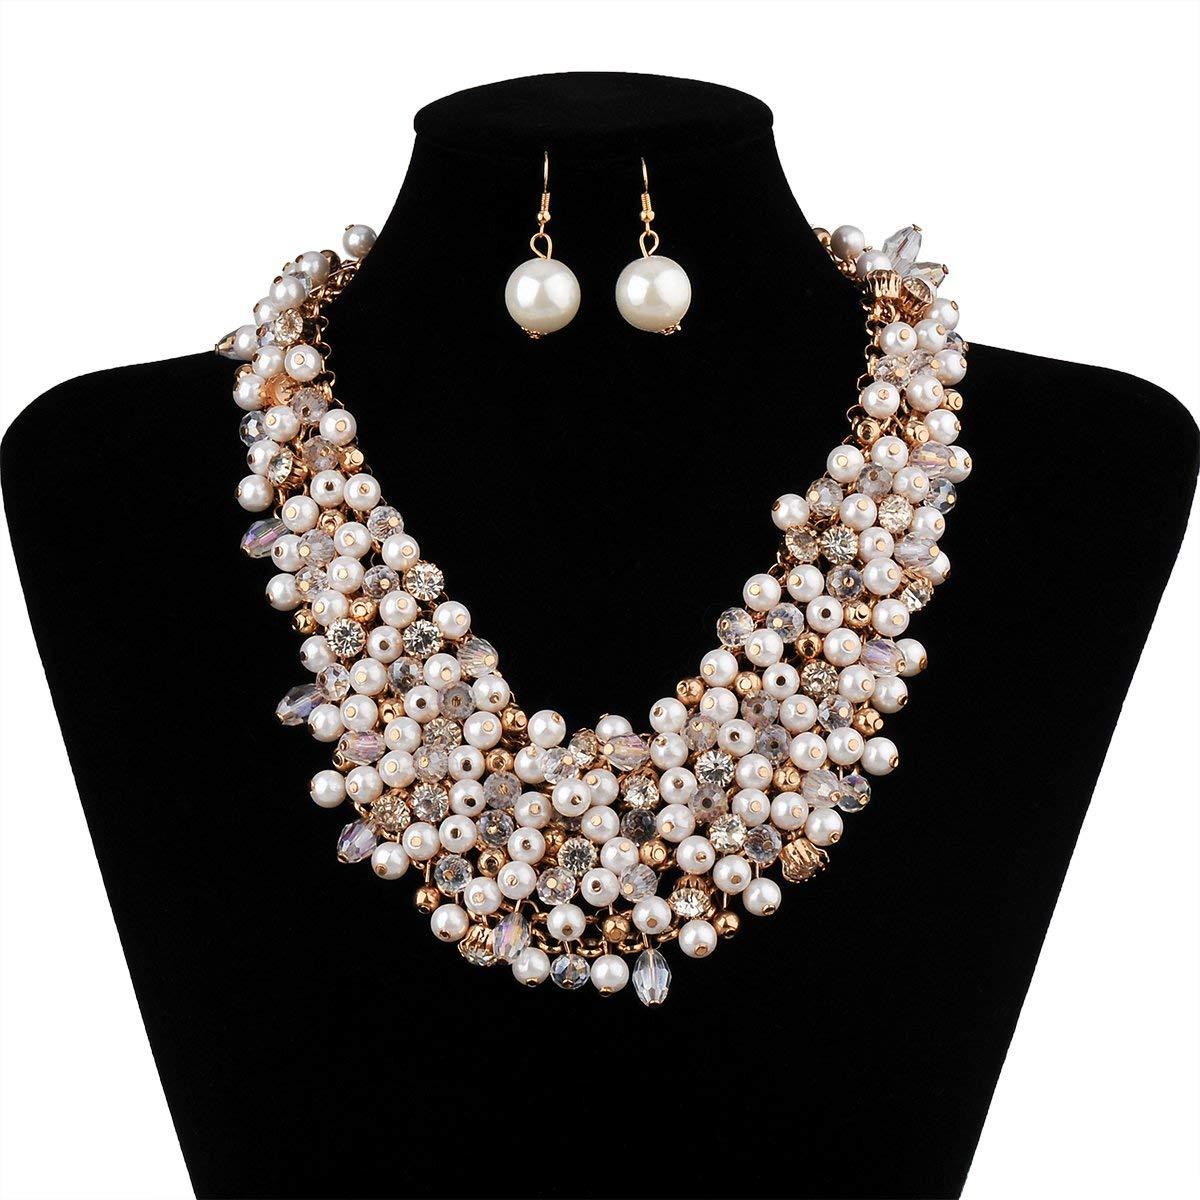 edb8e650f5cc3 IPINK Fashion Women Big Faux Pearl Multi Strand Chunky Evening Jewelry Set